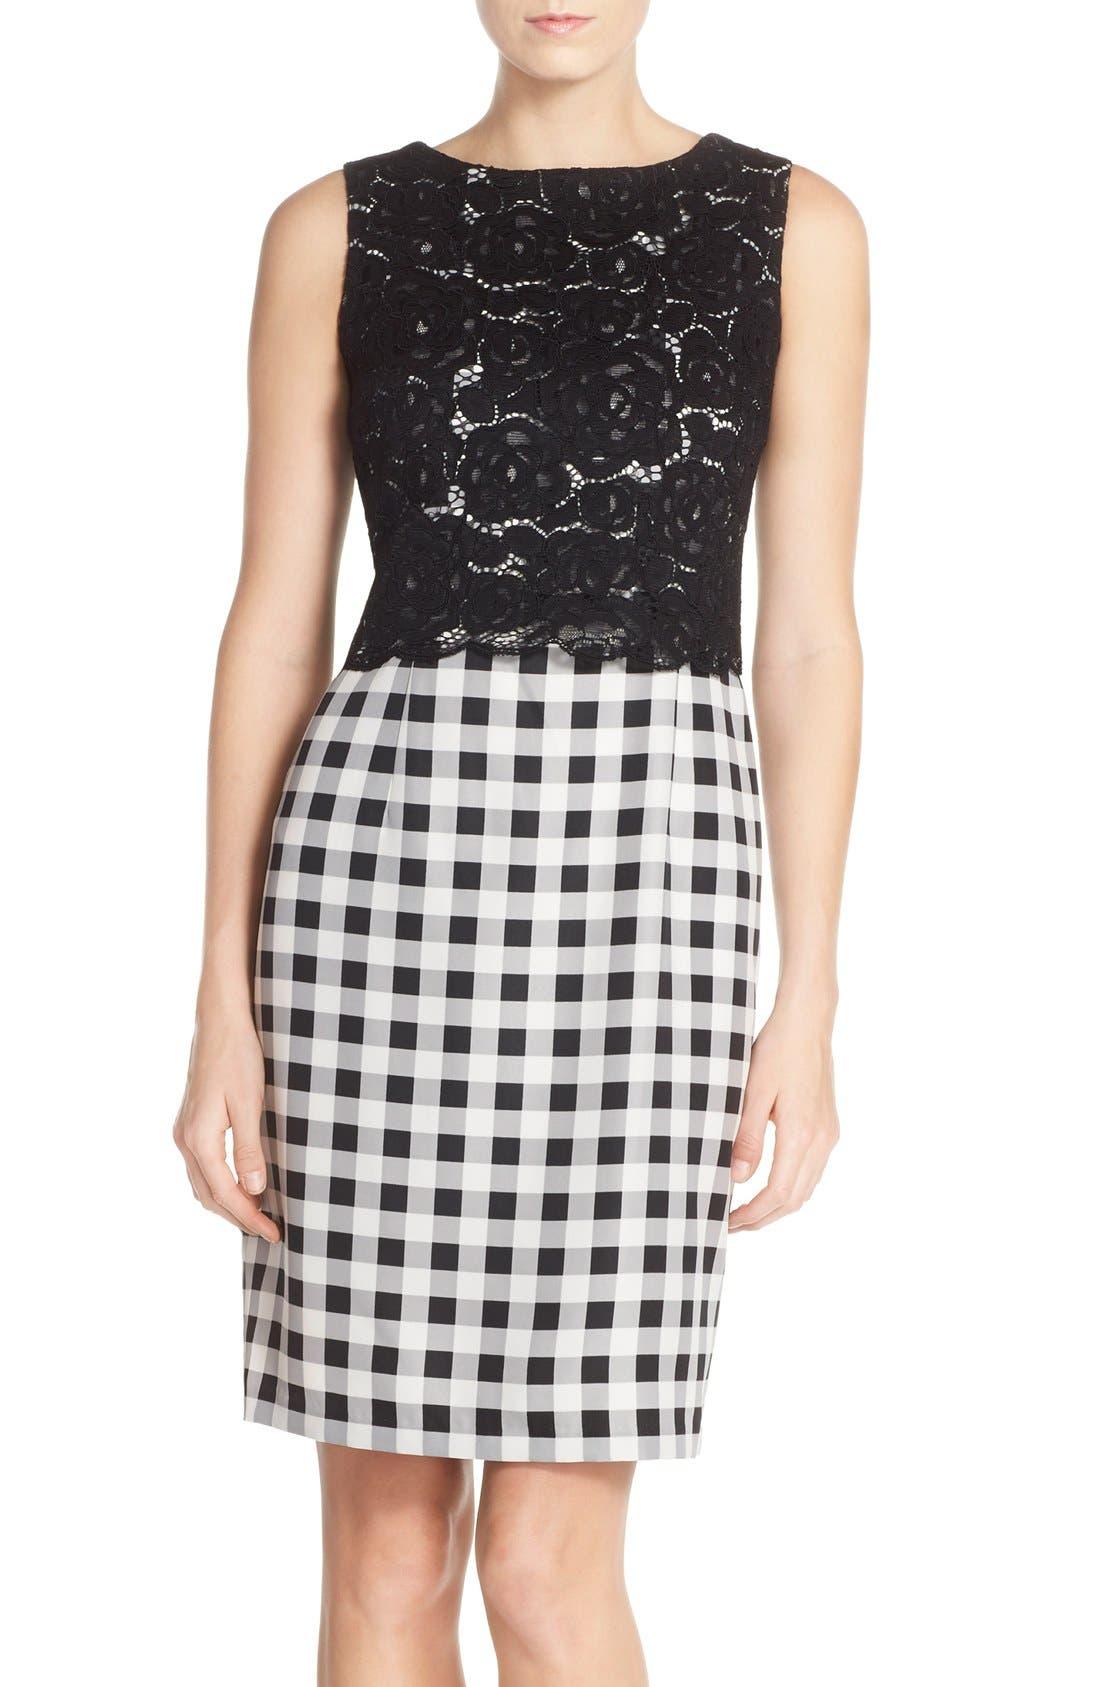 ELLEN TRACY Lace & Gingham Sheath Dress